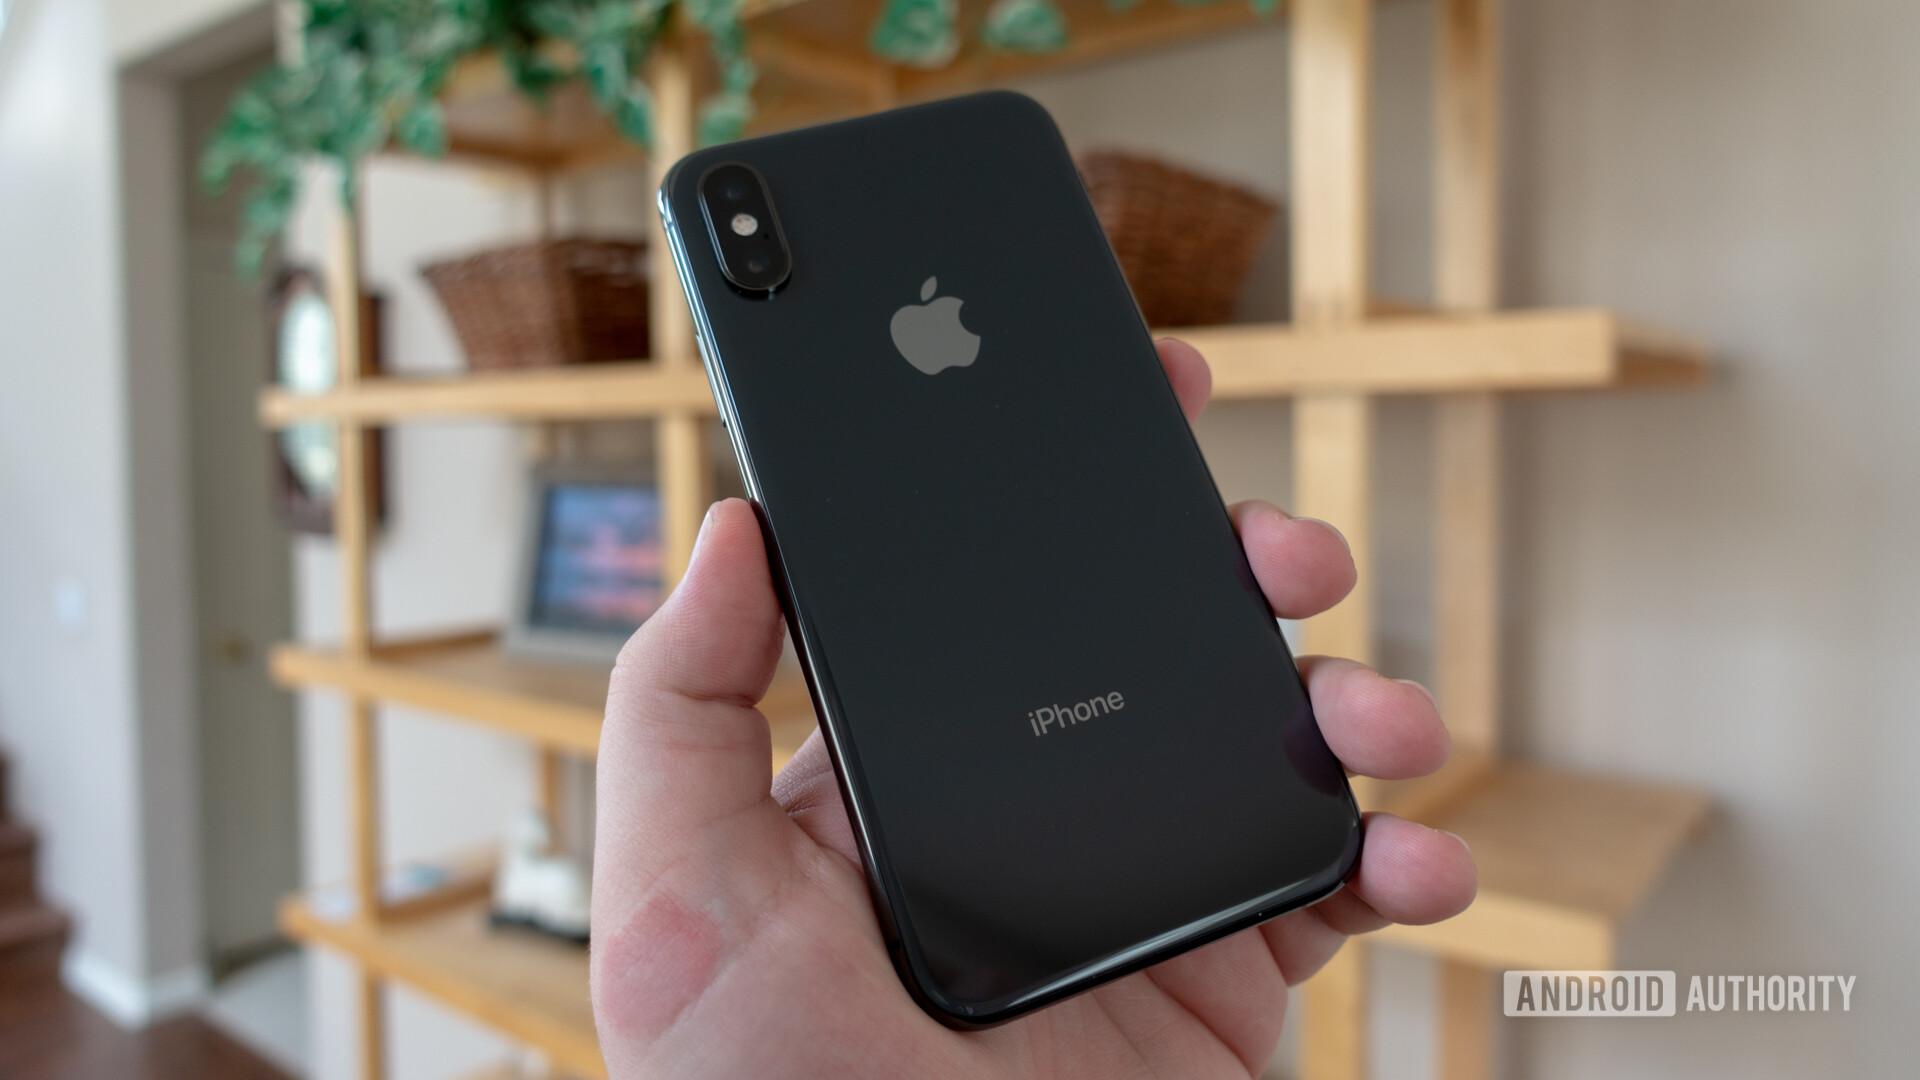 Apple iPhone XS rear